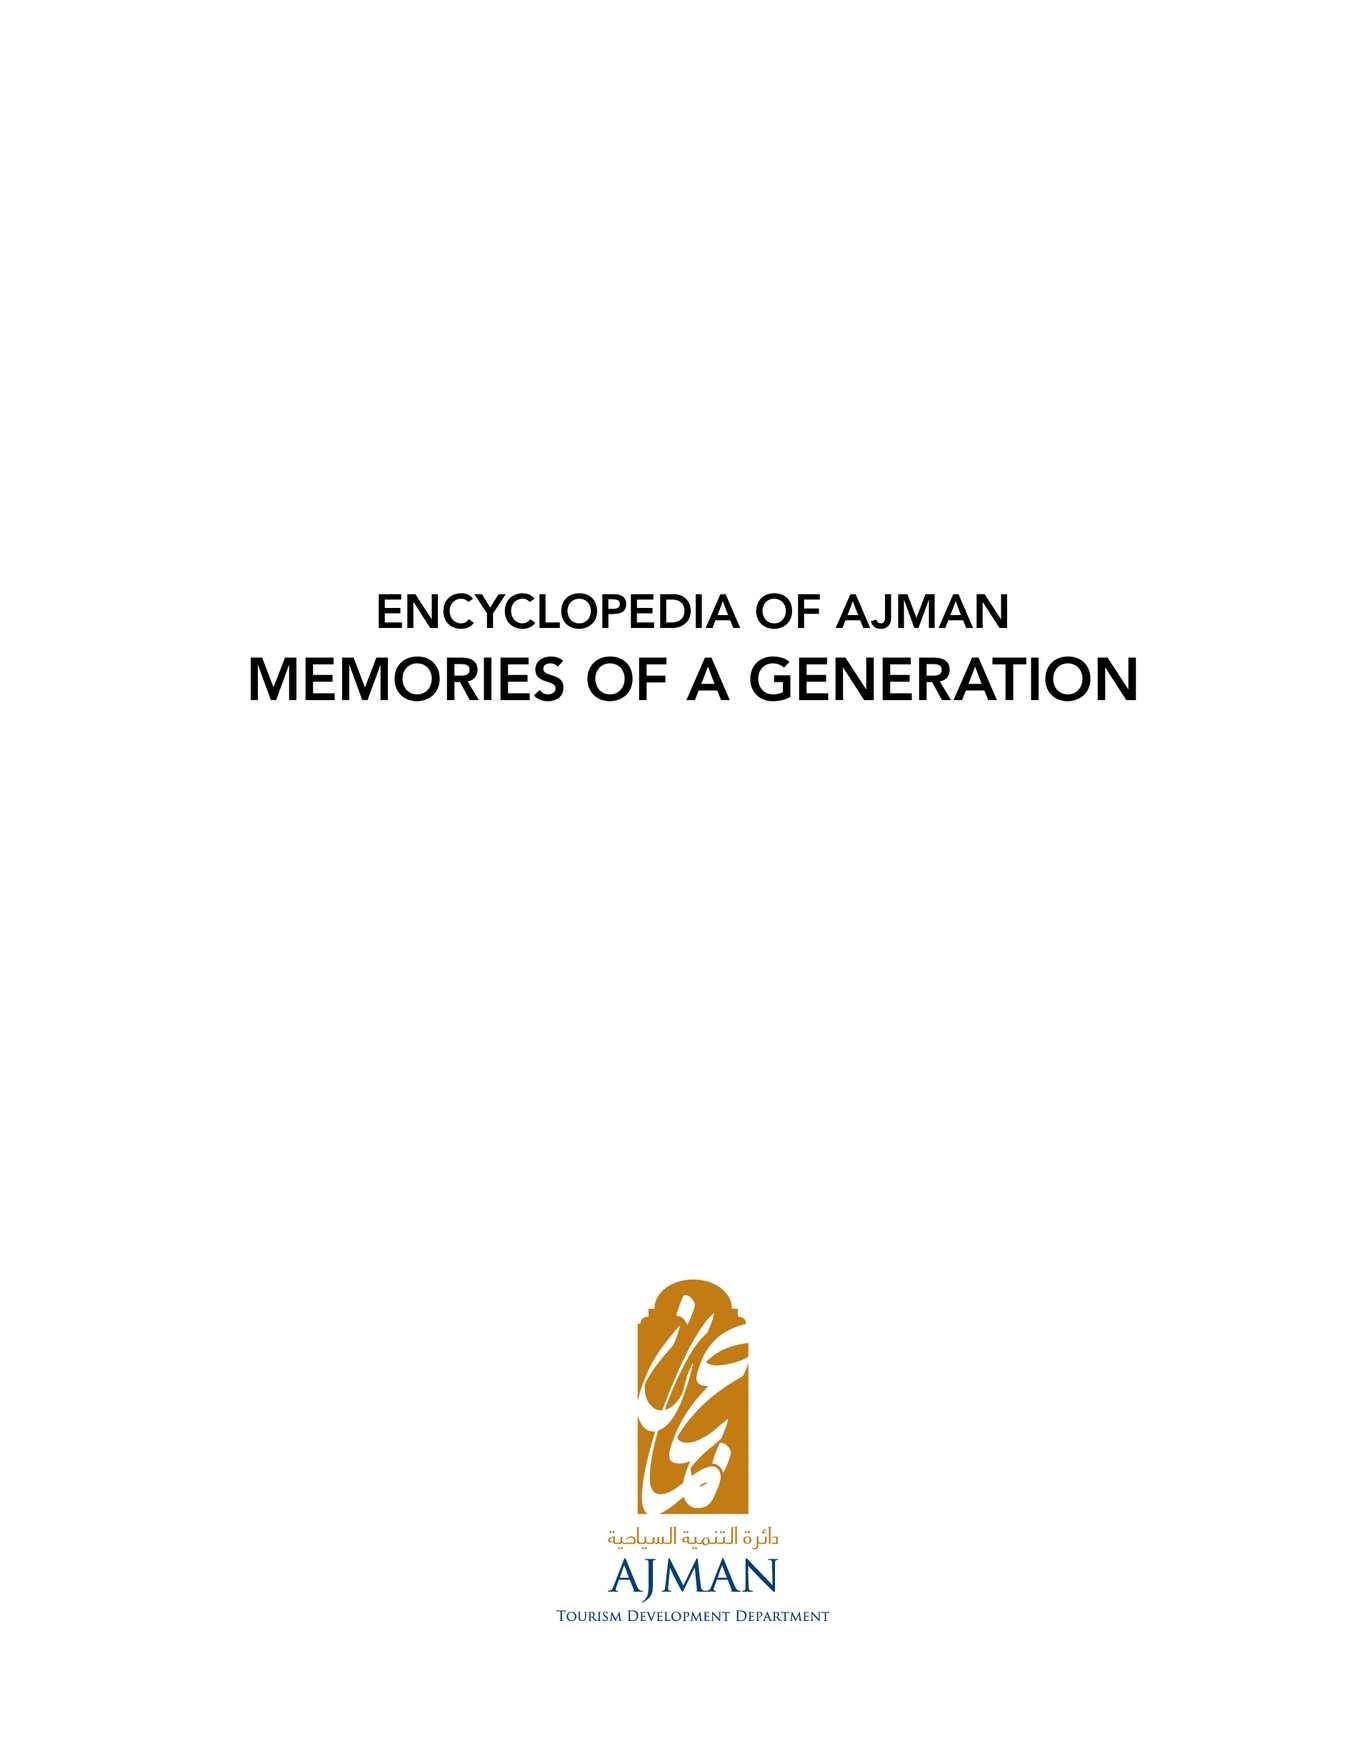 03a5a59ef0d6 Calaméo - Ajman English Encyclopedia